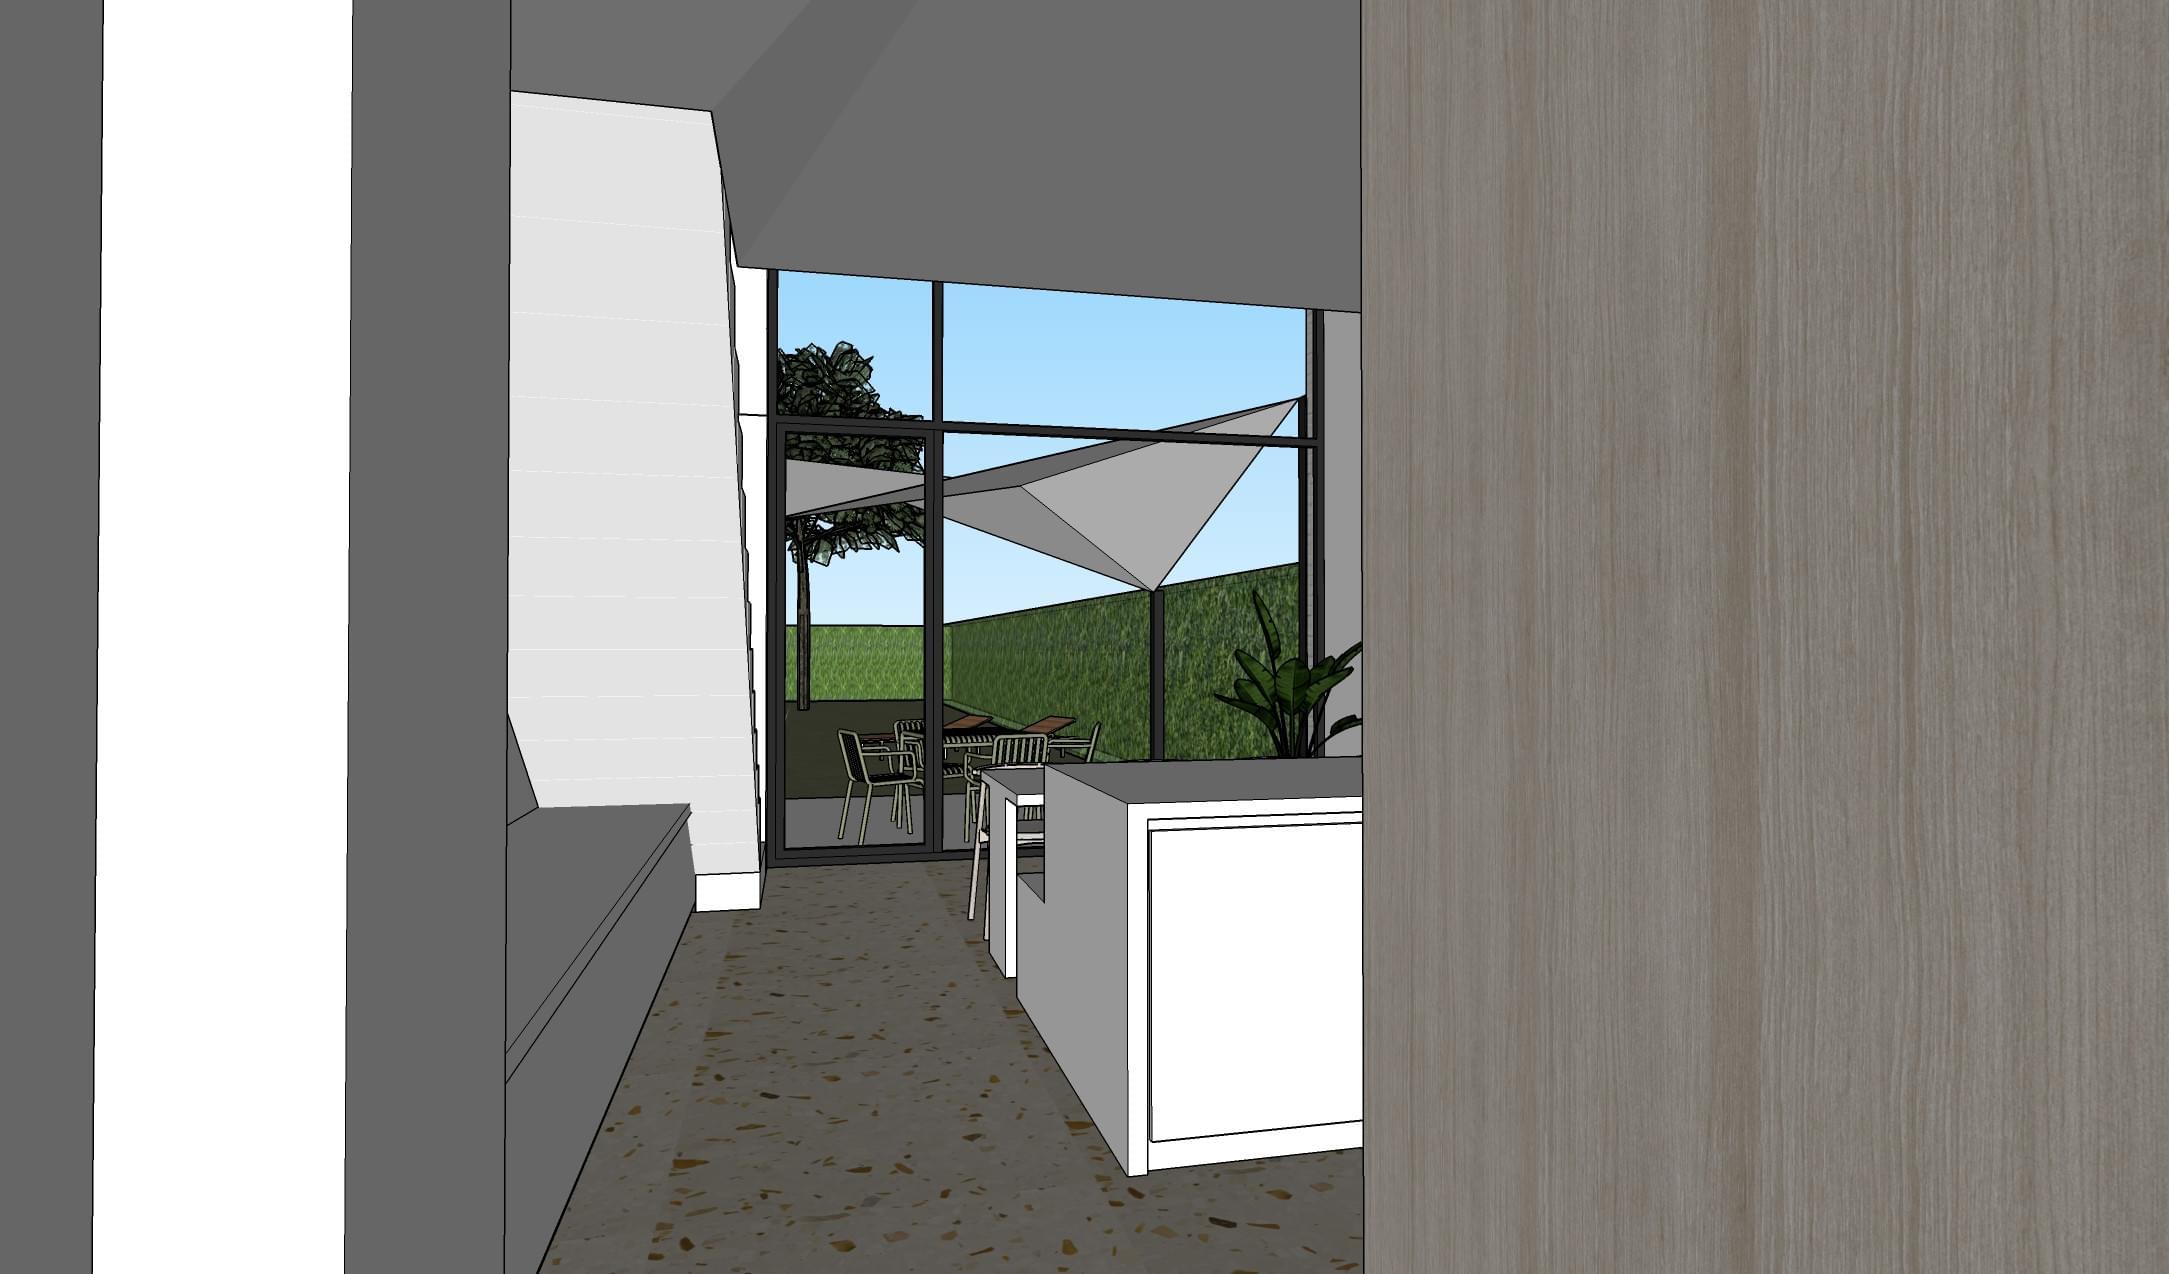 keuken eetkamer tuin